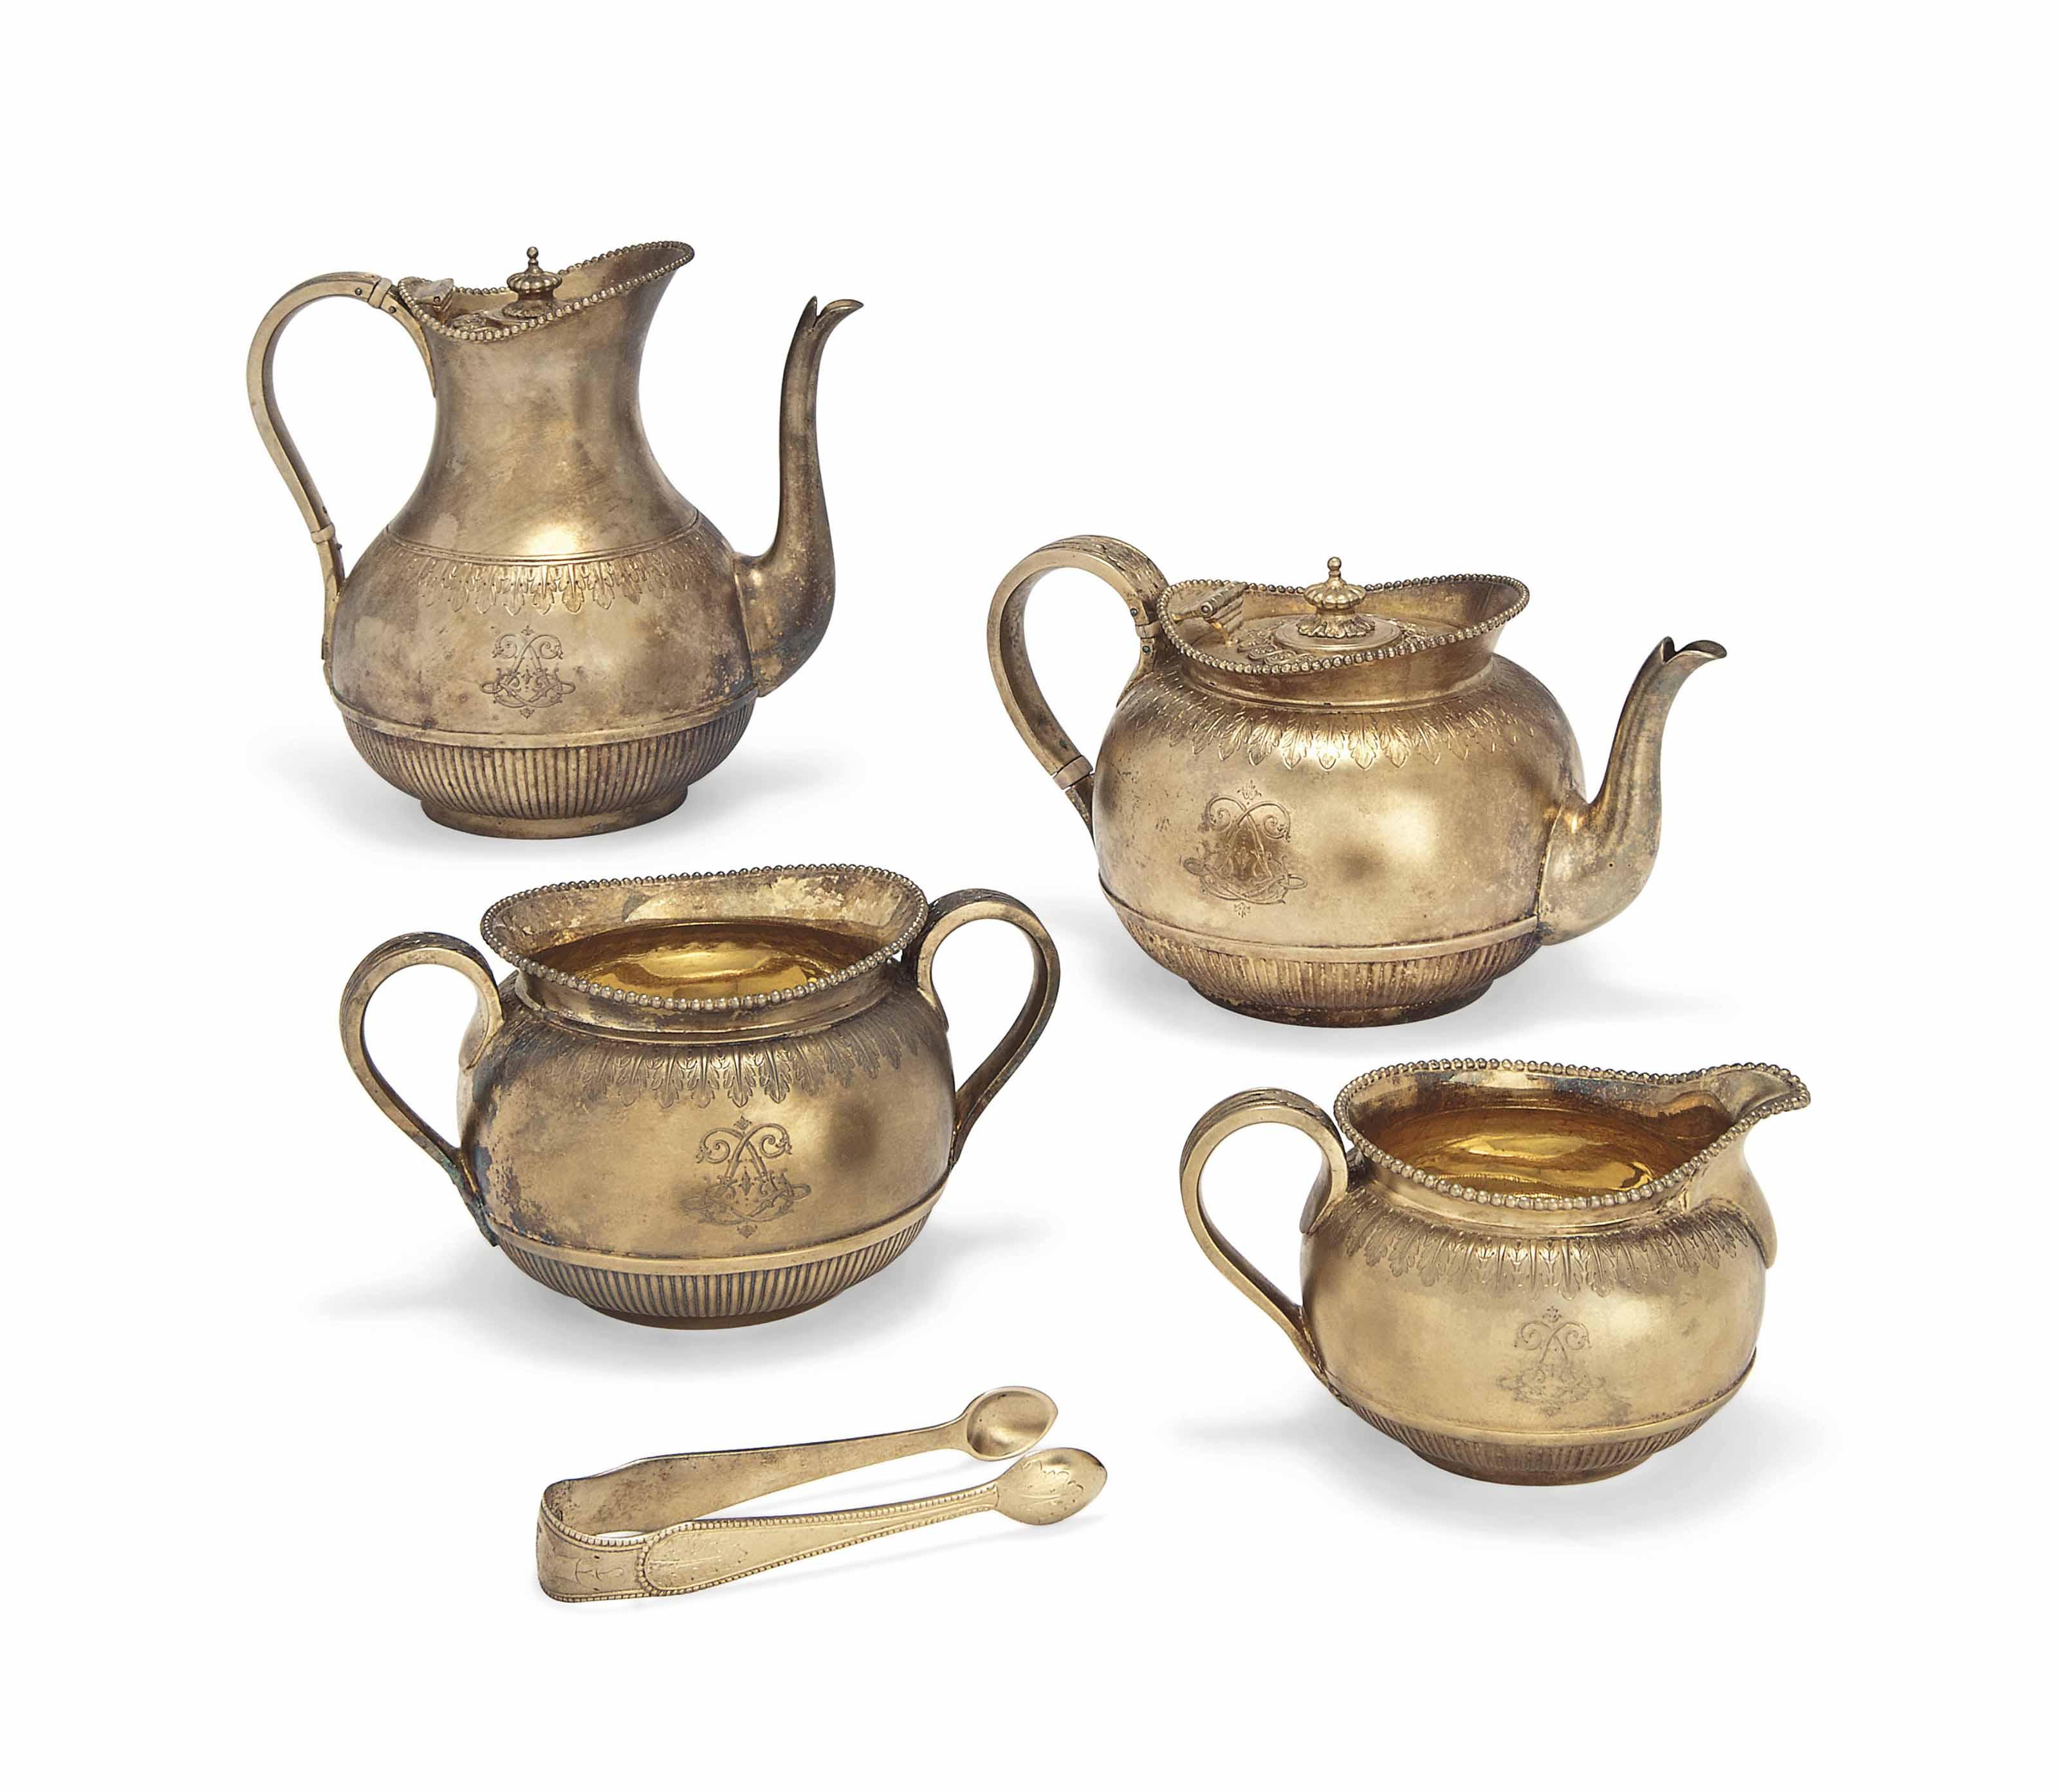 A VICTORIAN FOUR-PIECE SILVER-GILT BACHELOR'S TEA AND COFFEE SET